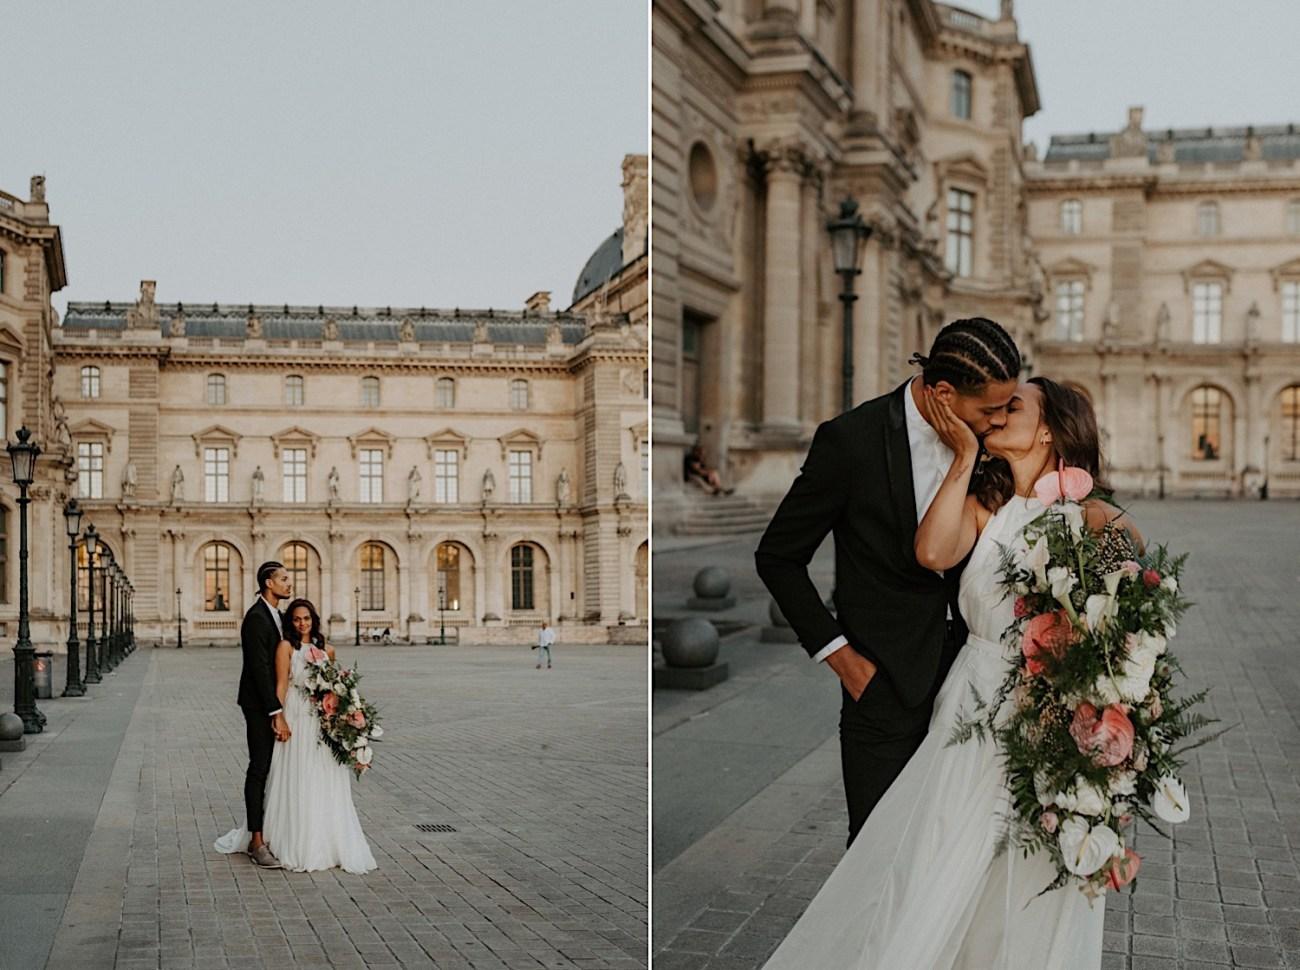 Paris Louvre Wedding Photos Paris Wedding Photographer Destination Wedding France Anais Possamai Photography 32